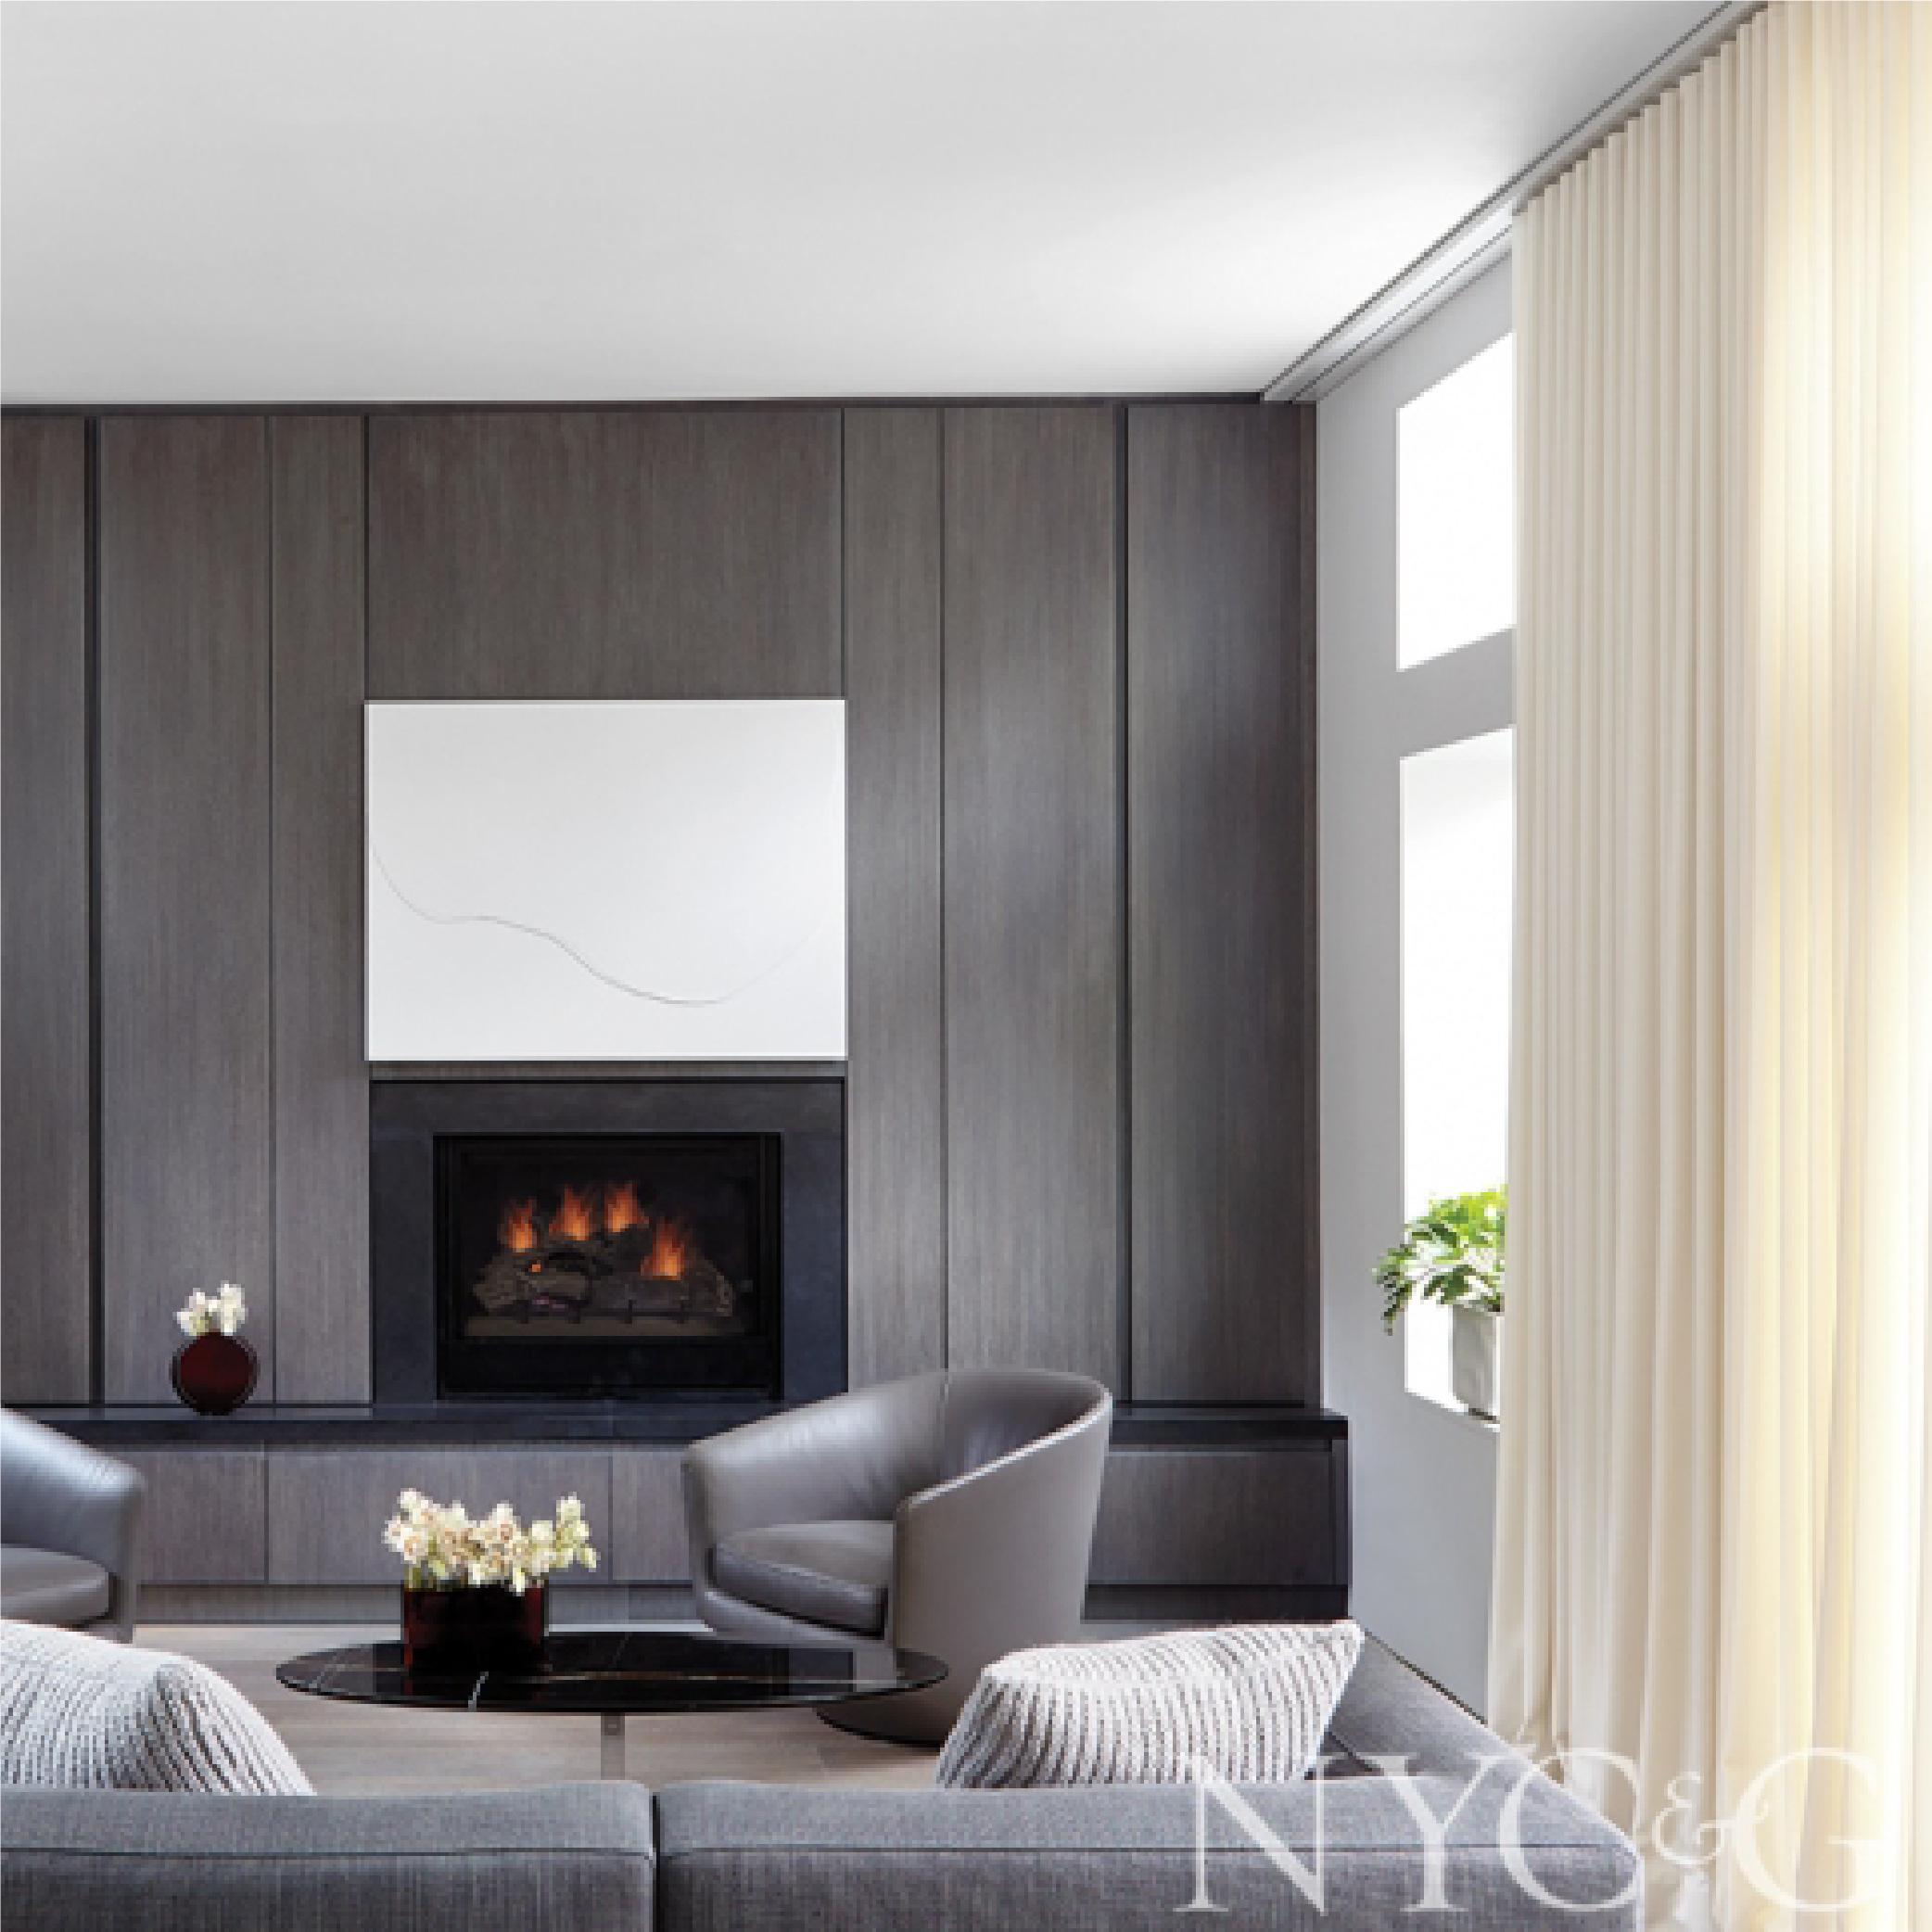 Fireplace artwork